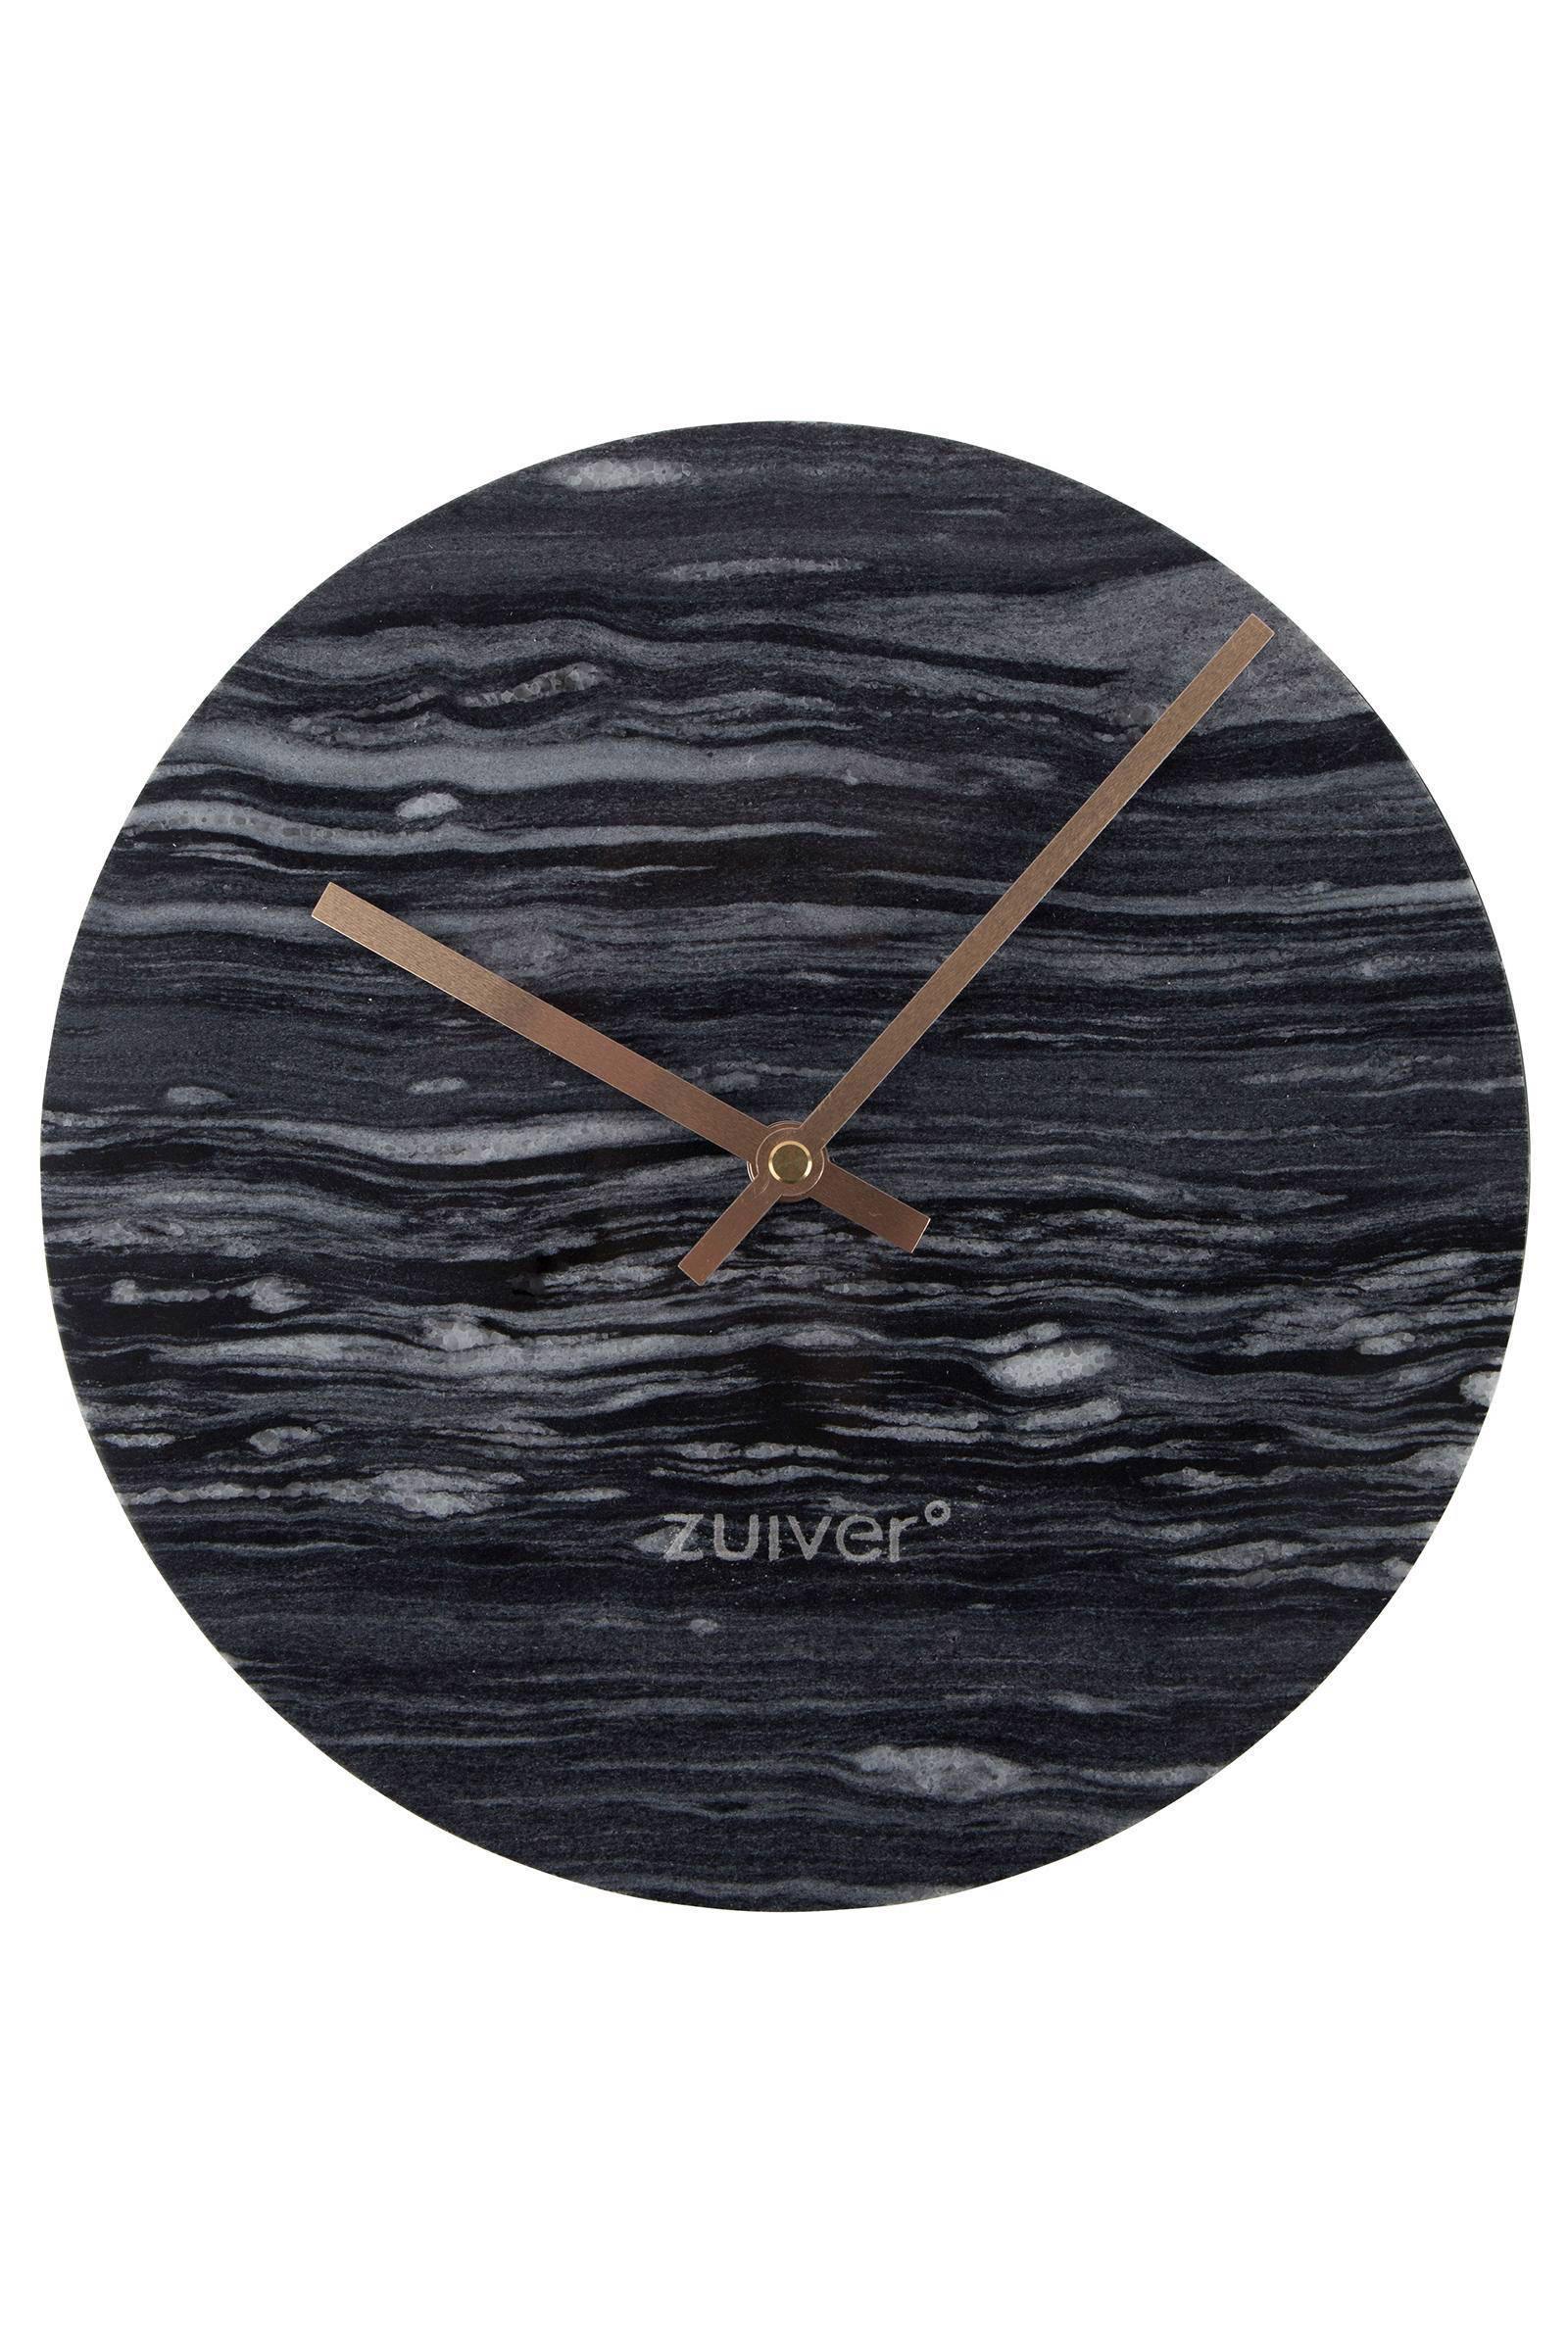 Zuiver Marble Time klok (Ø25 cm)